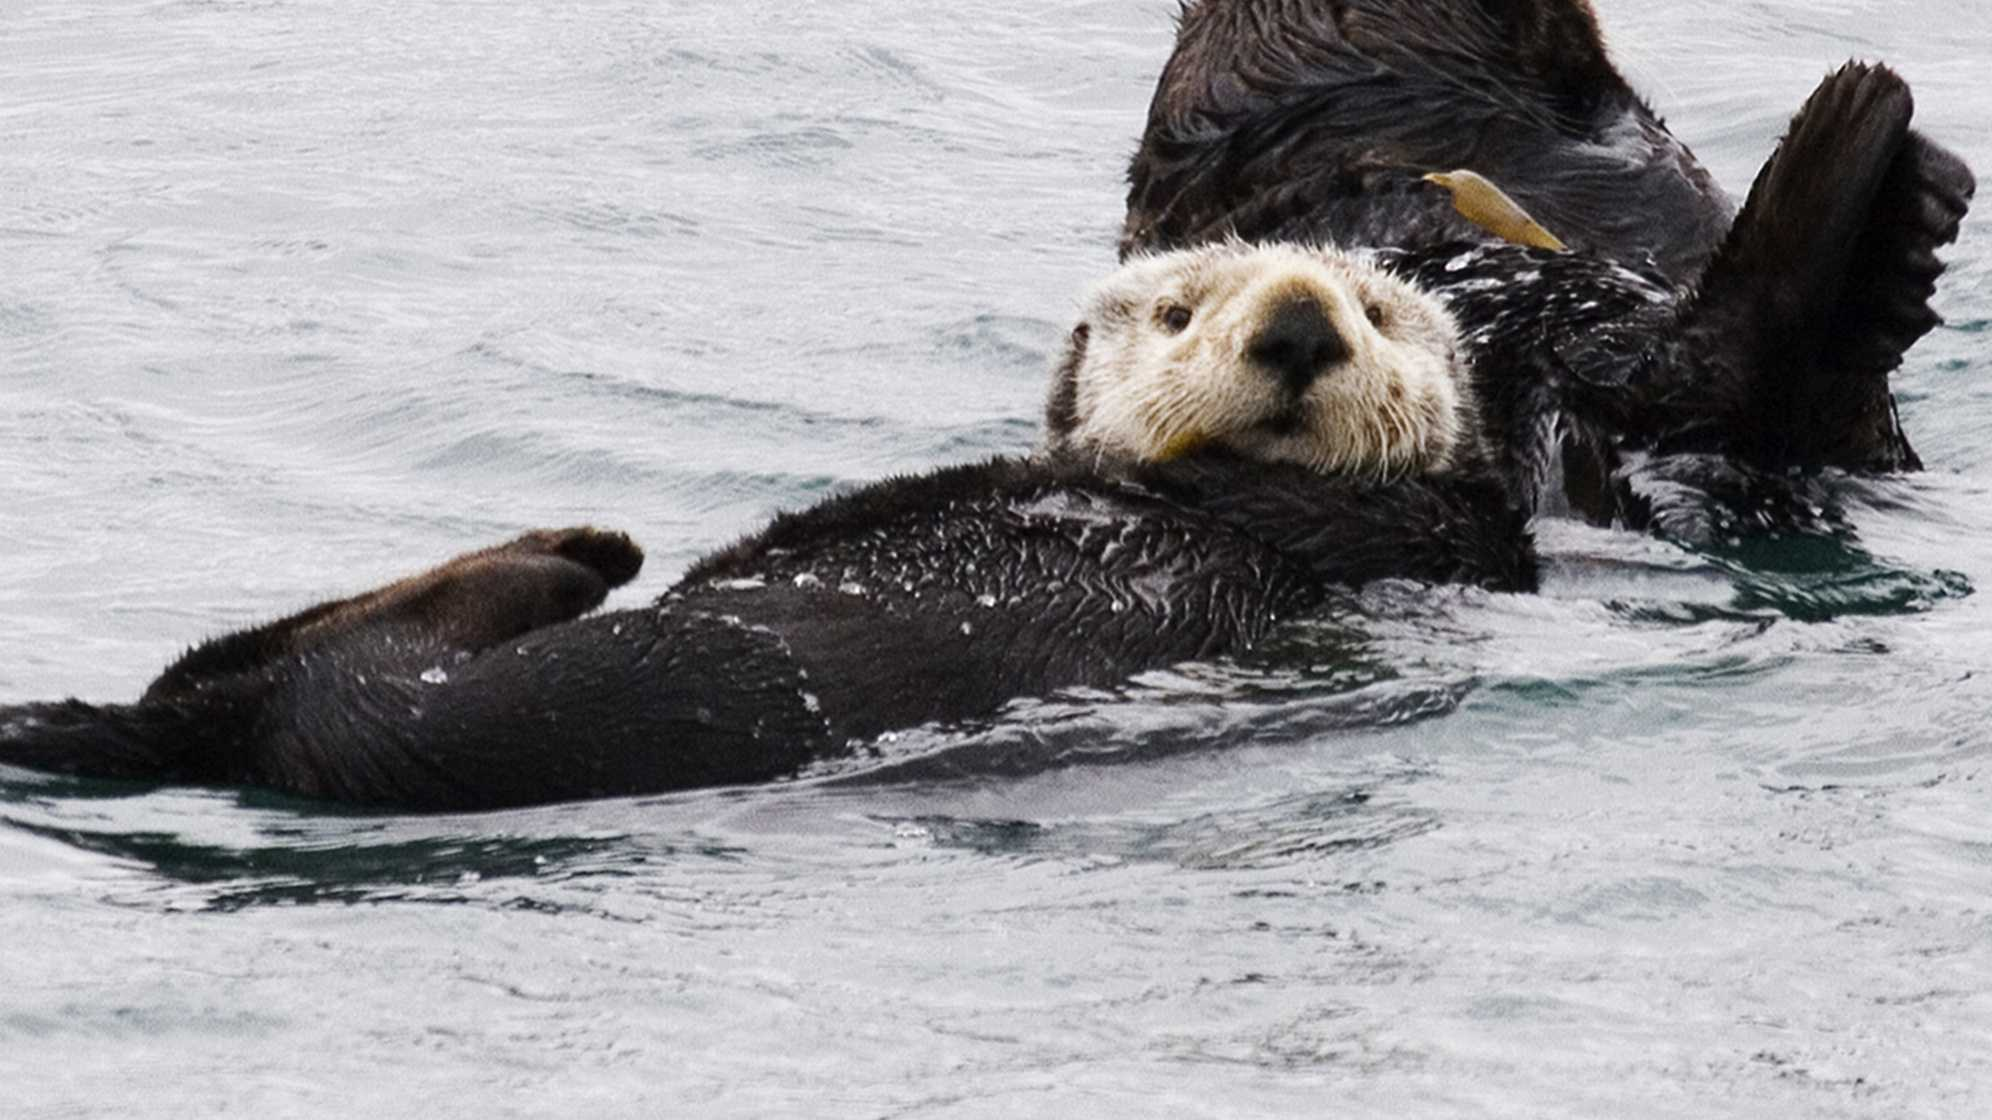 Sea otter